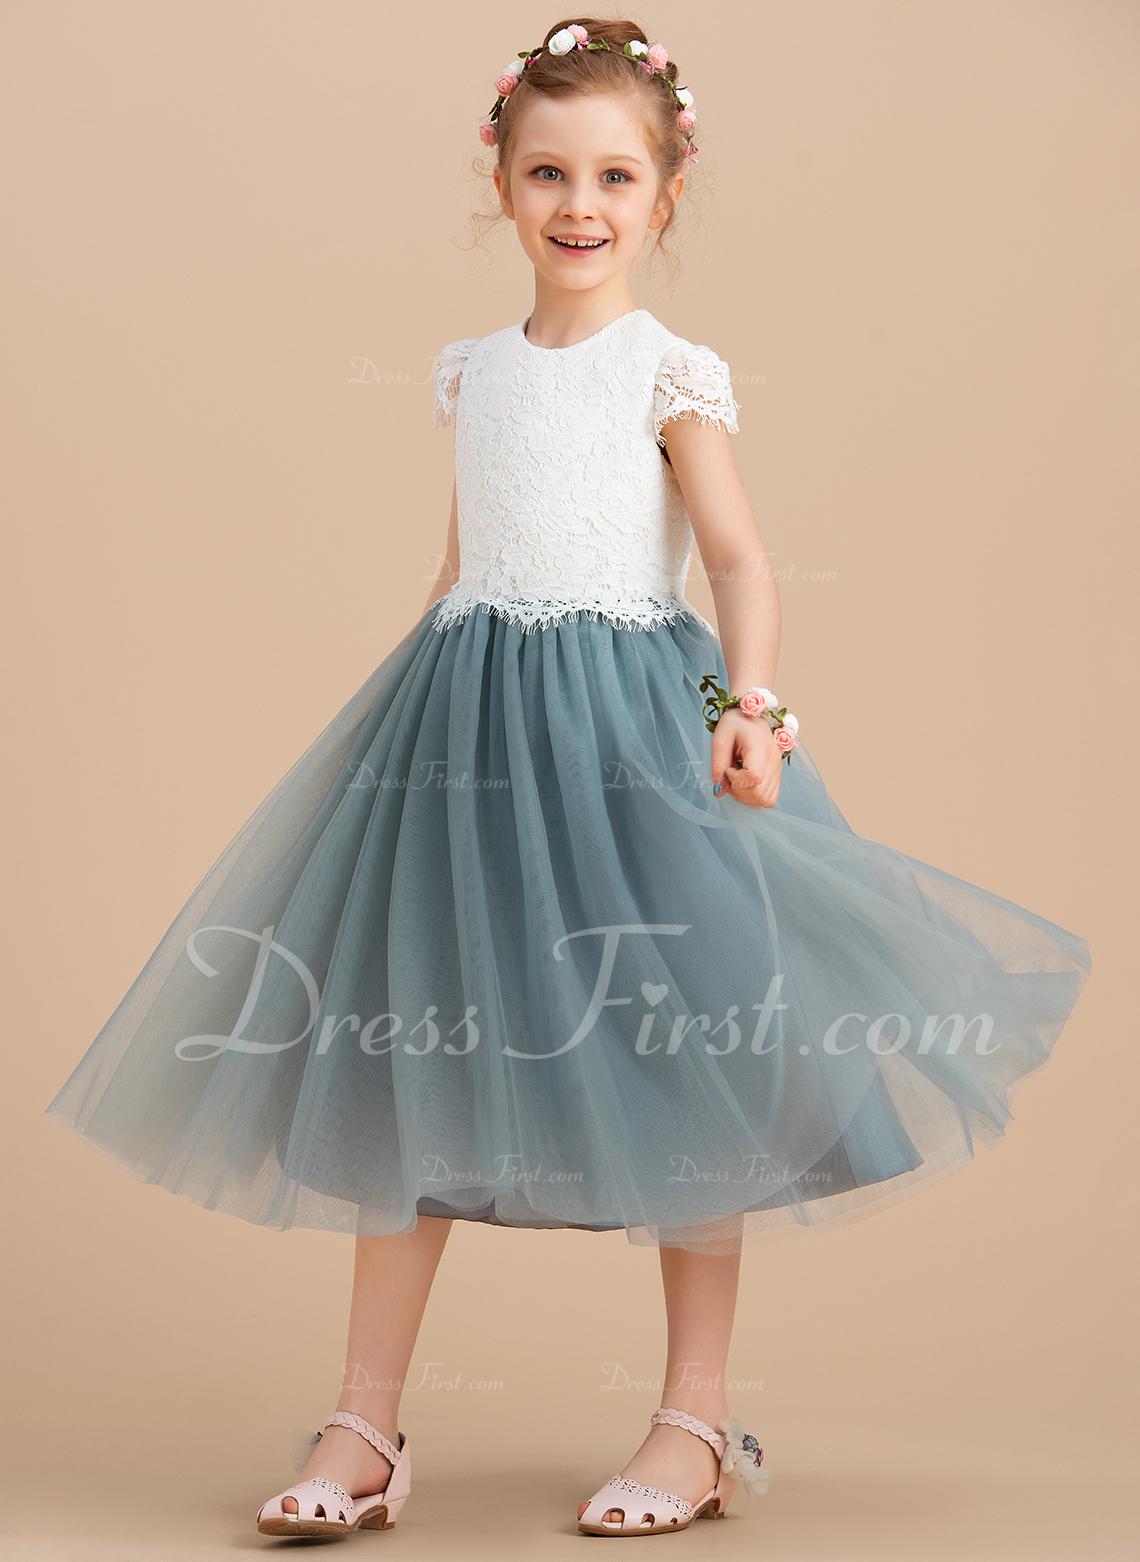 A-Line/Princess Tea-length Flower Girl Dress - Tulle/Lace Sleeveless Scoop Neck